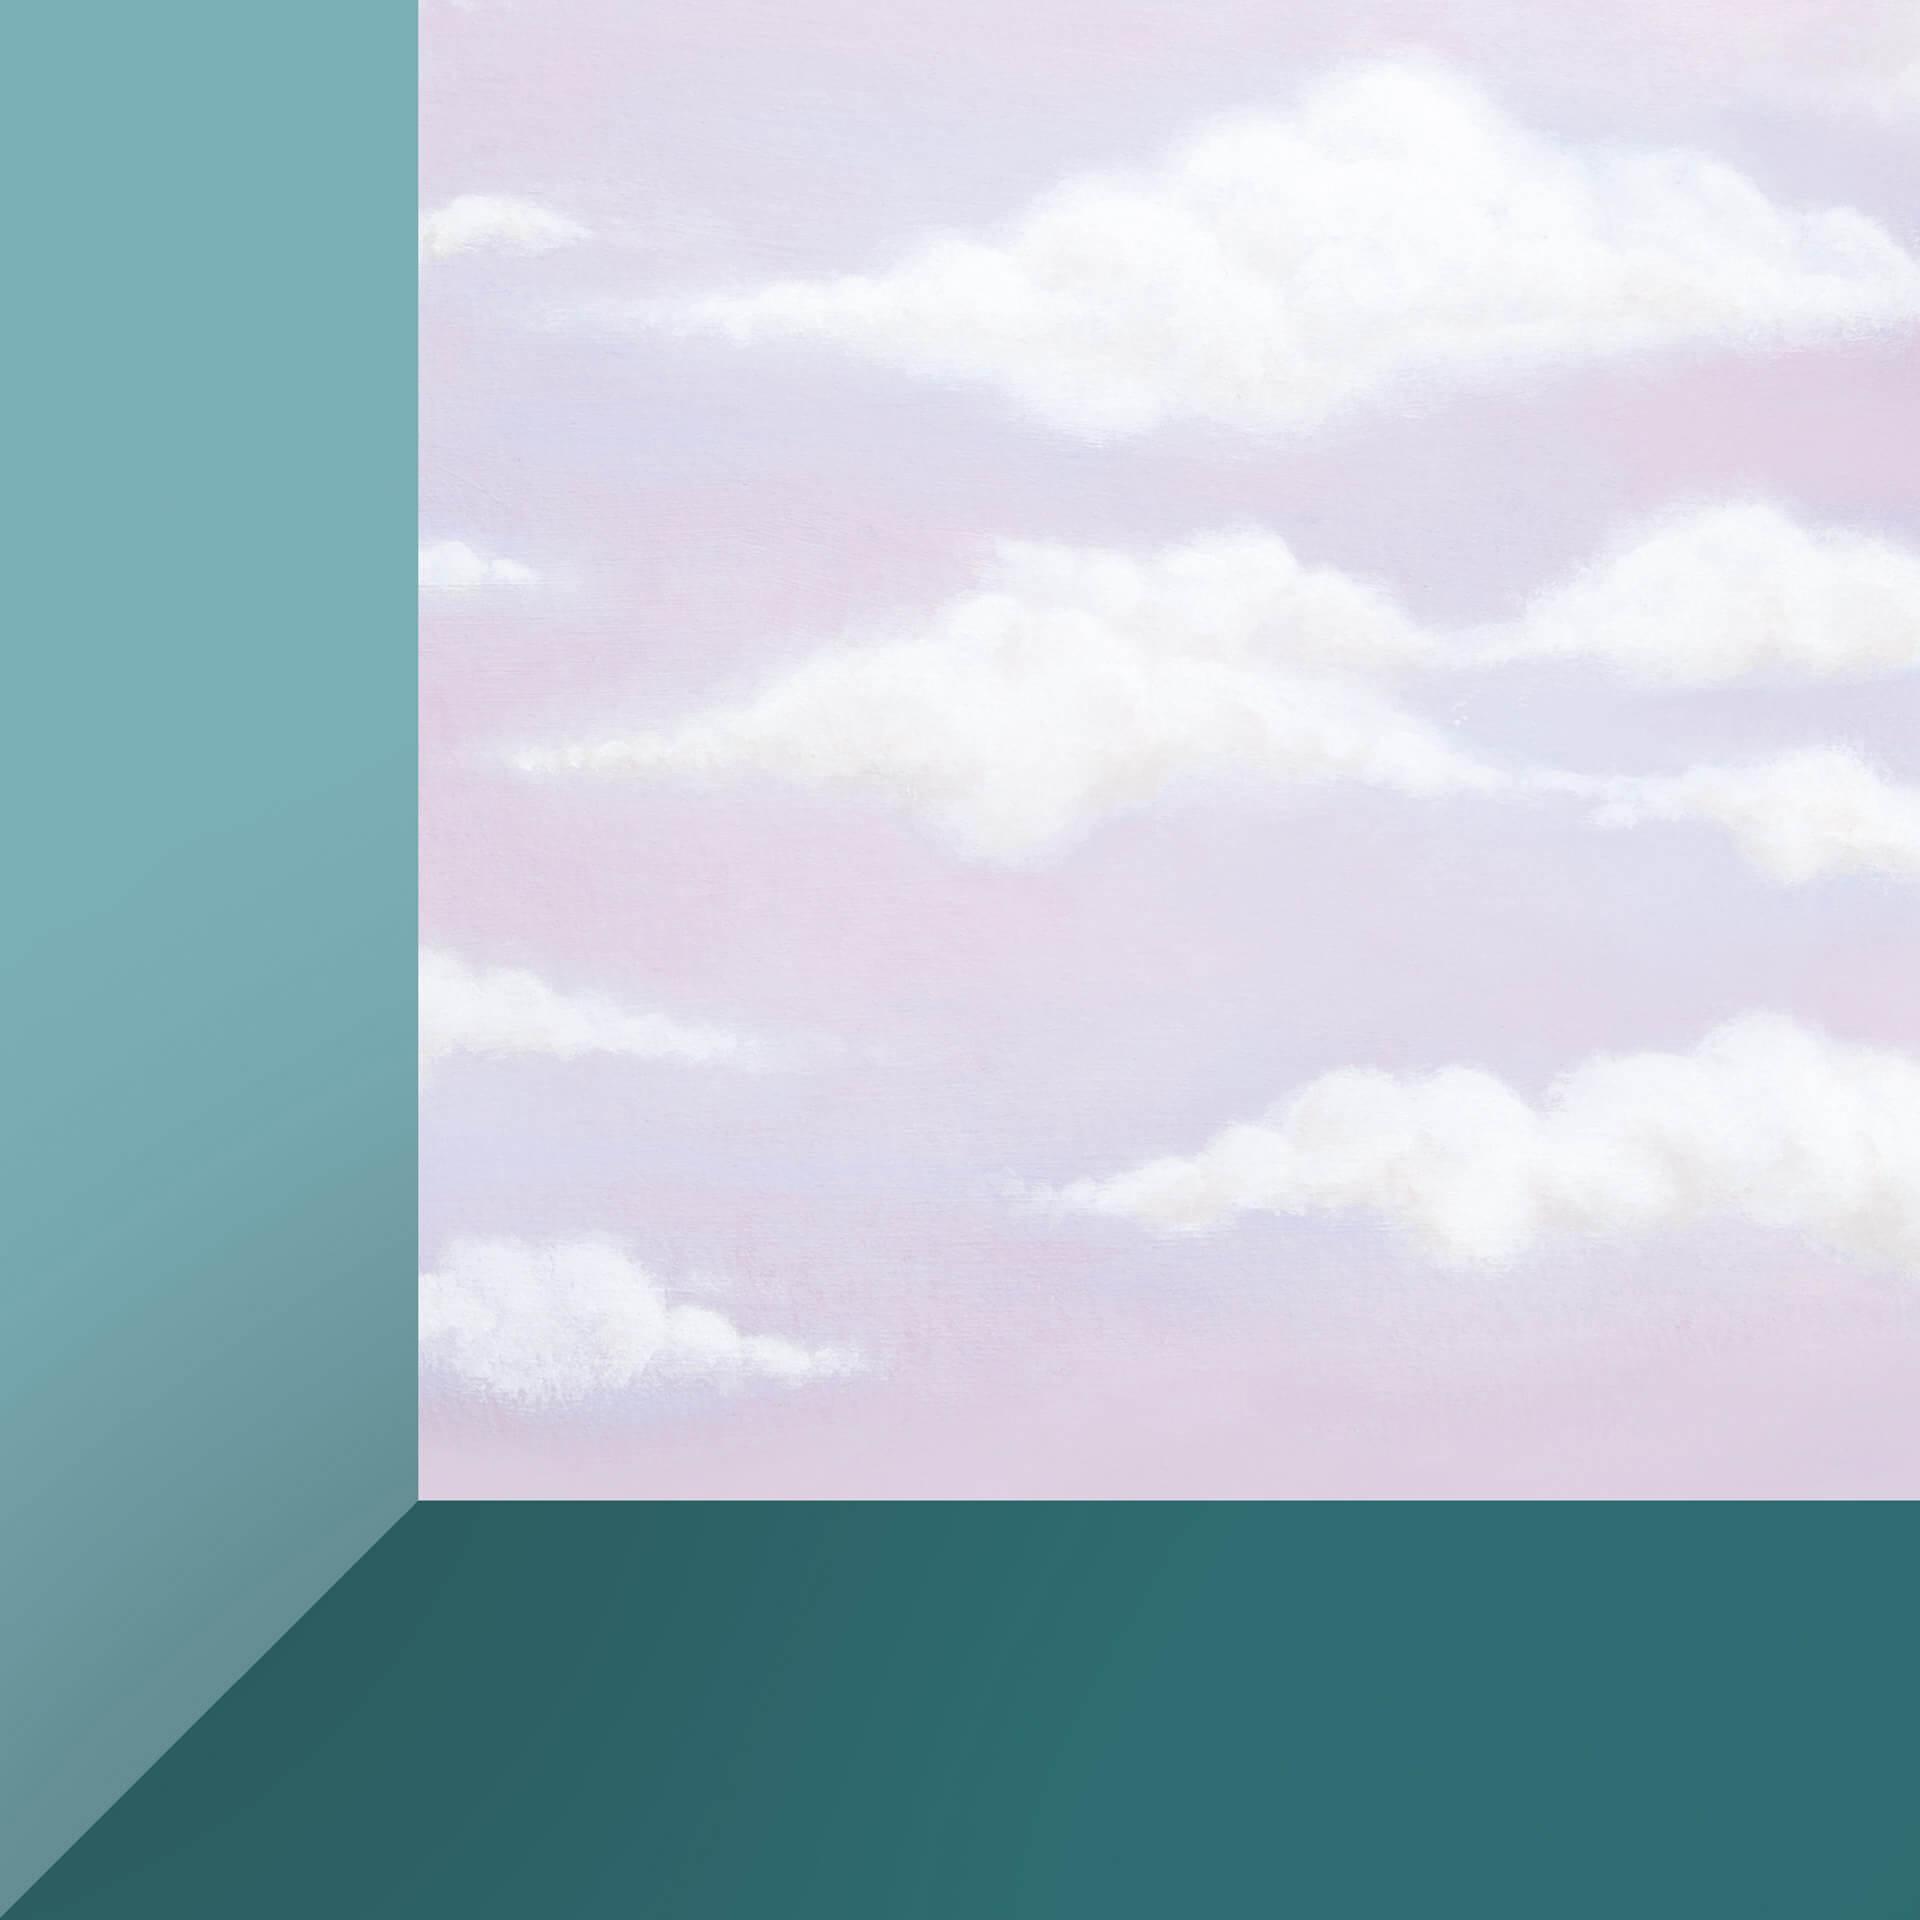 hermes-window-spring19-illustration3